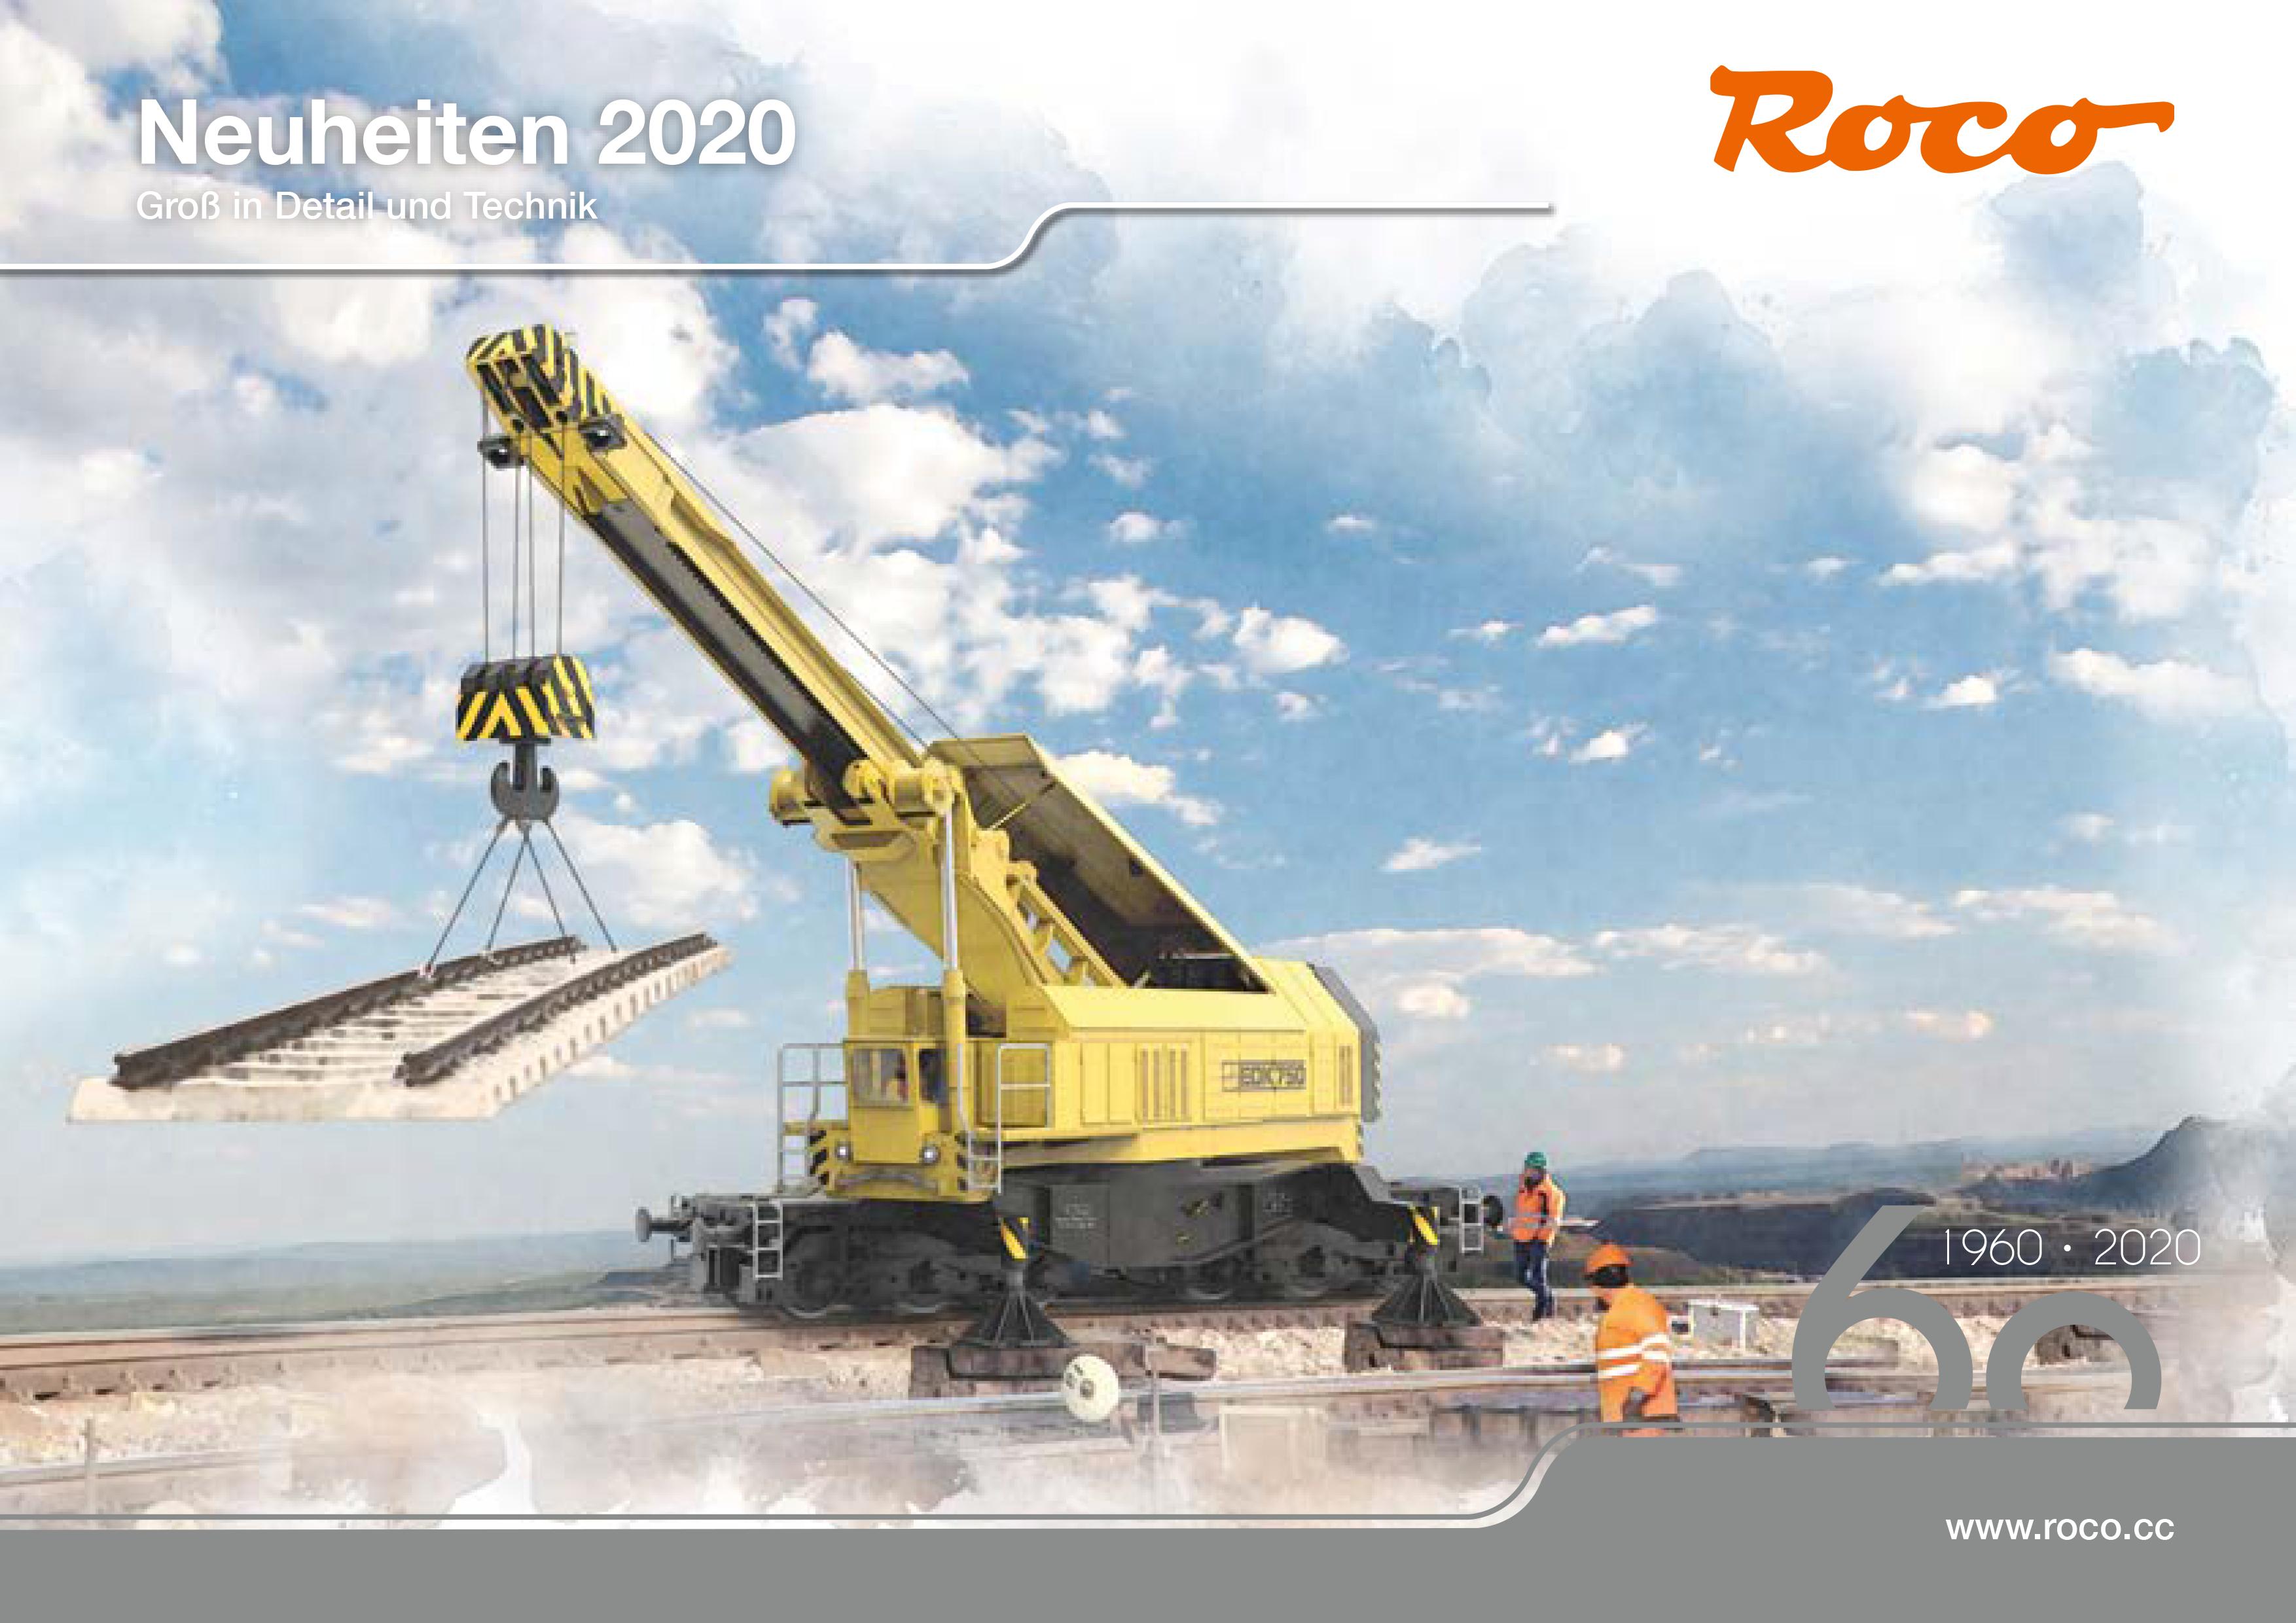 Roco_Neuheiten_2020-1